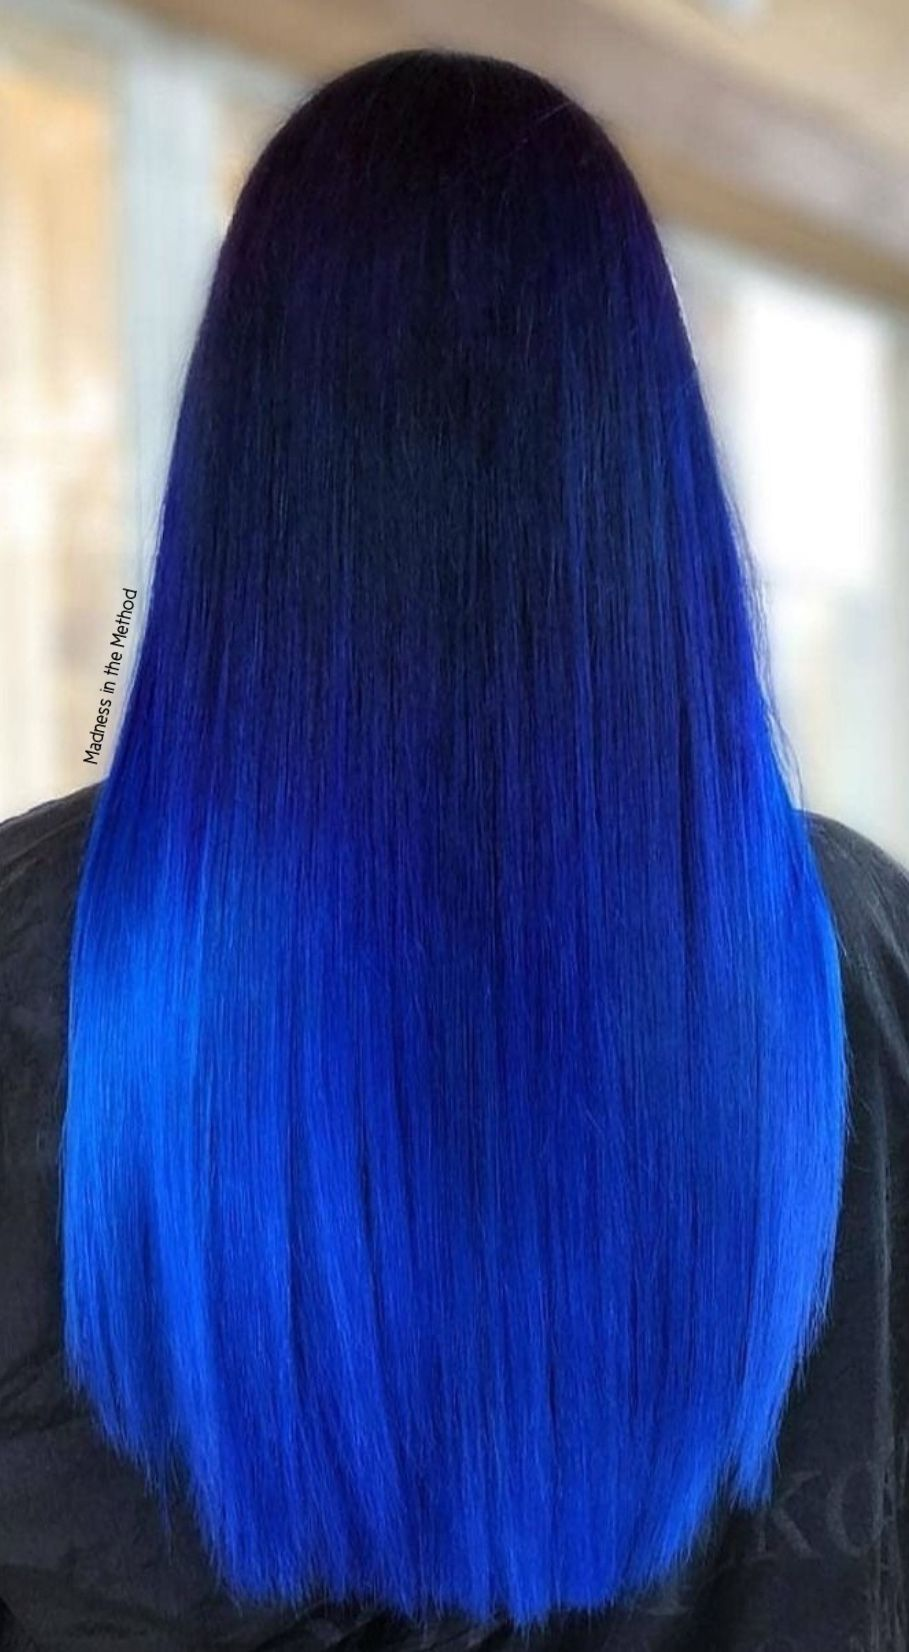 ⊰✿☆ Hair.Candy ☆✿⊱ ະ✧MadnessintheMethod✧ະ #hair